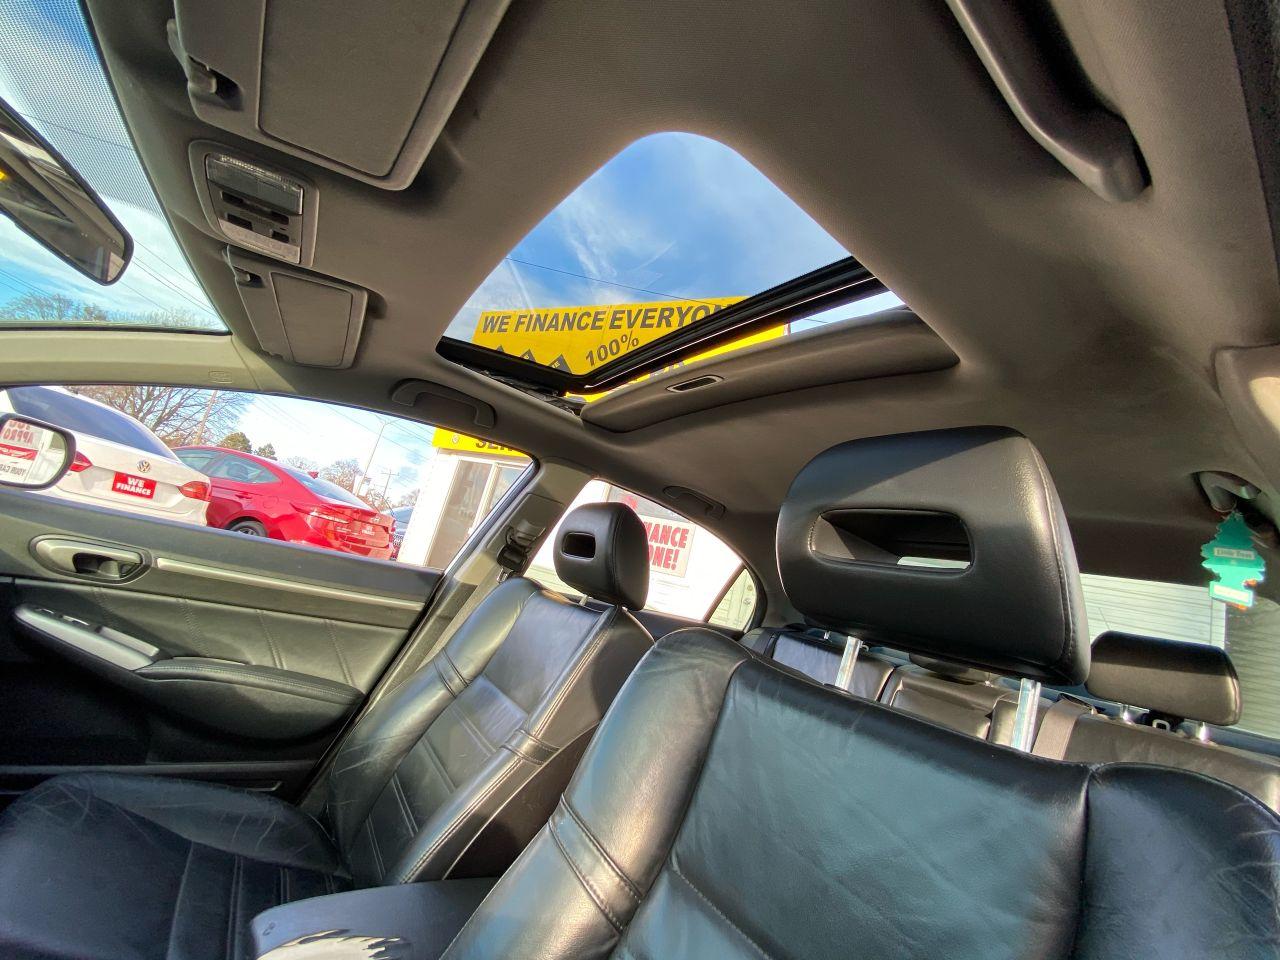 2009 Acura CSX